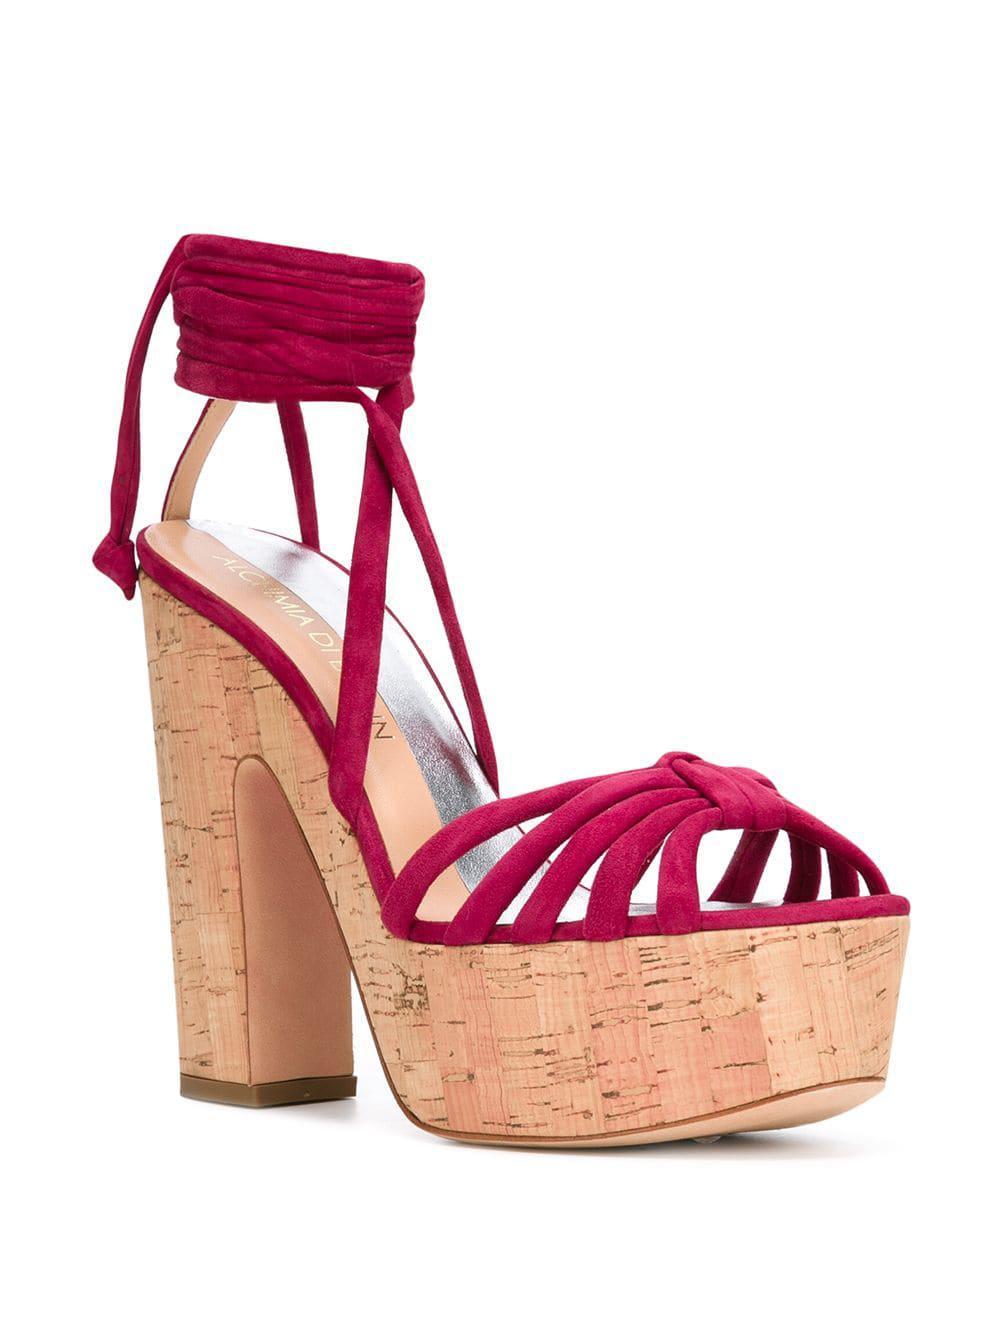 82458f5de3e Lyst - Alchimia Di Ballin Platform Sandals in Pink - Save  0.7518796992481214%